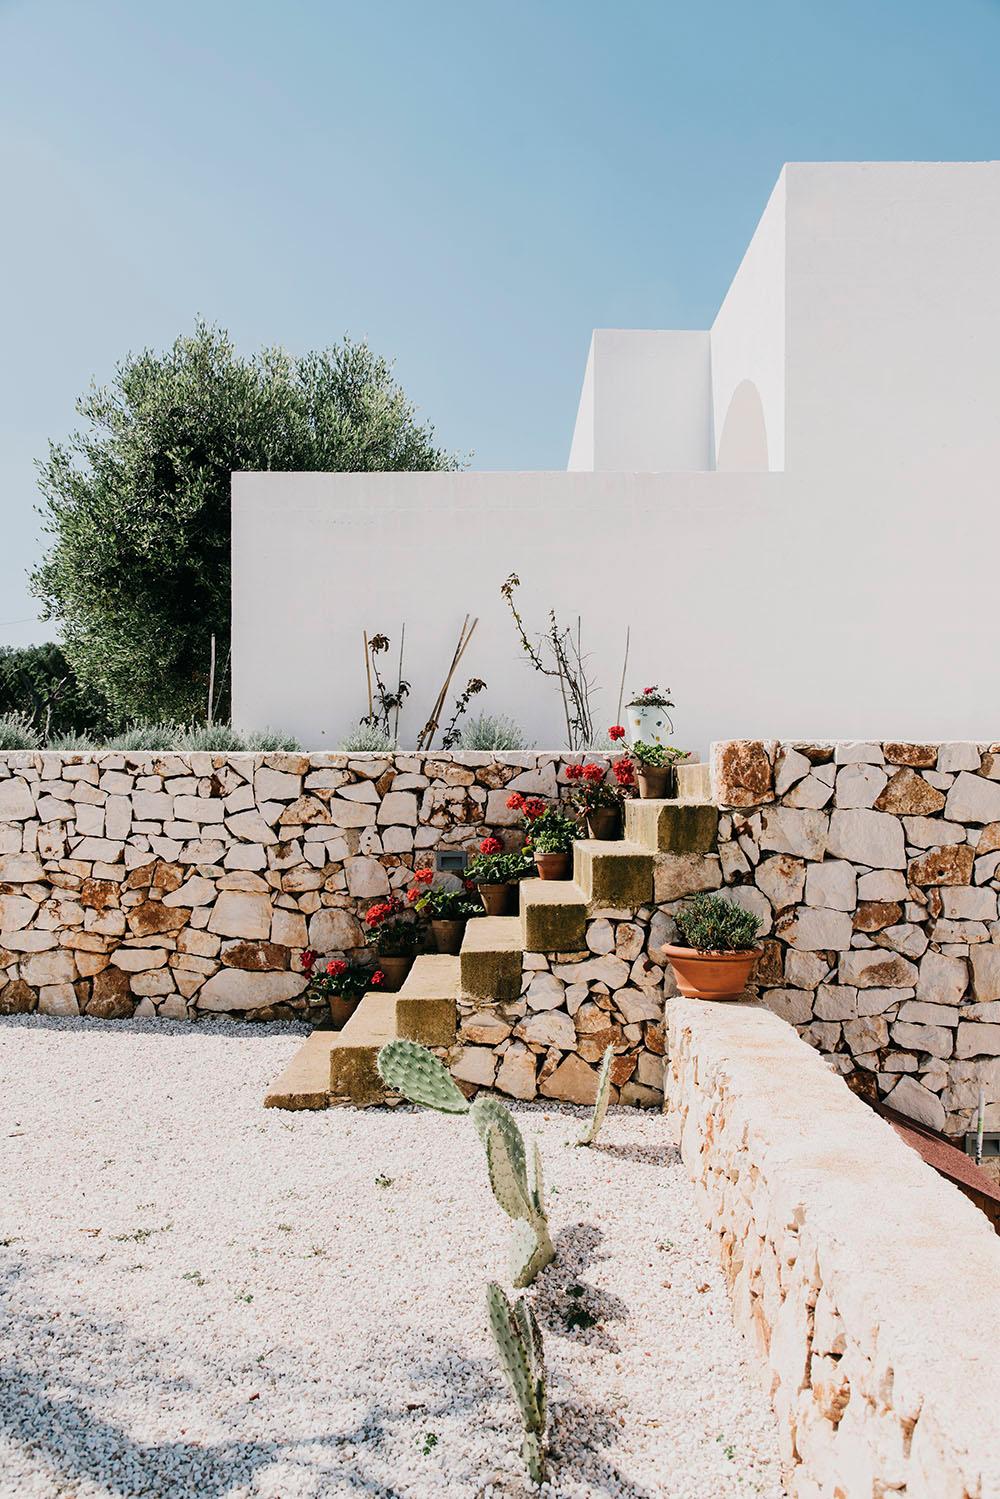 Masseria Moroseta: A Modern-Day Farmhouse by Andrew Trotter